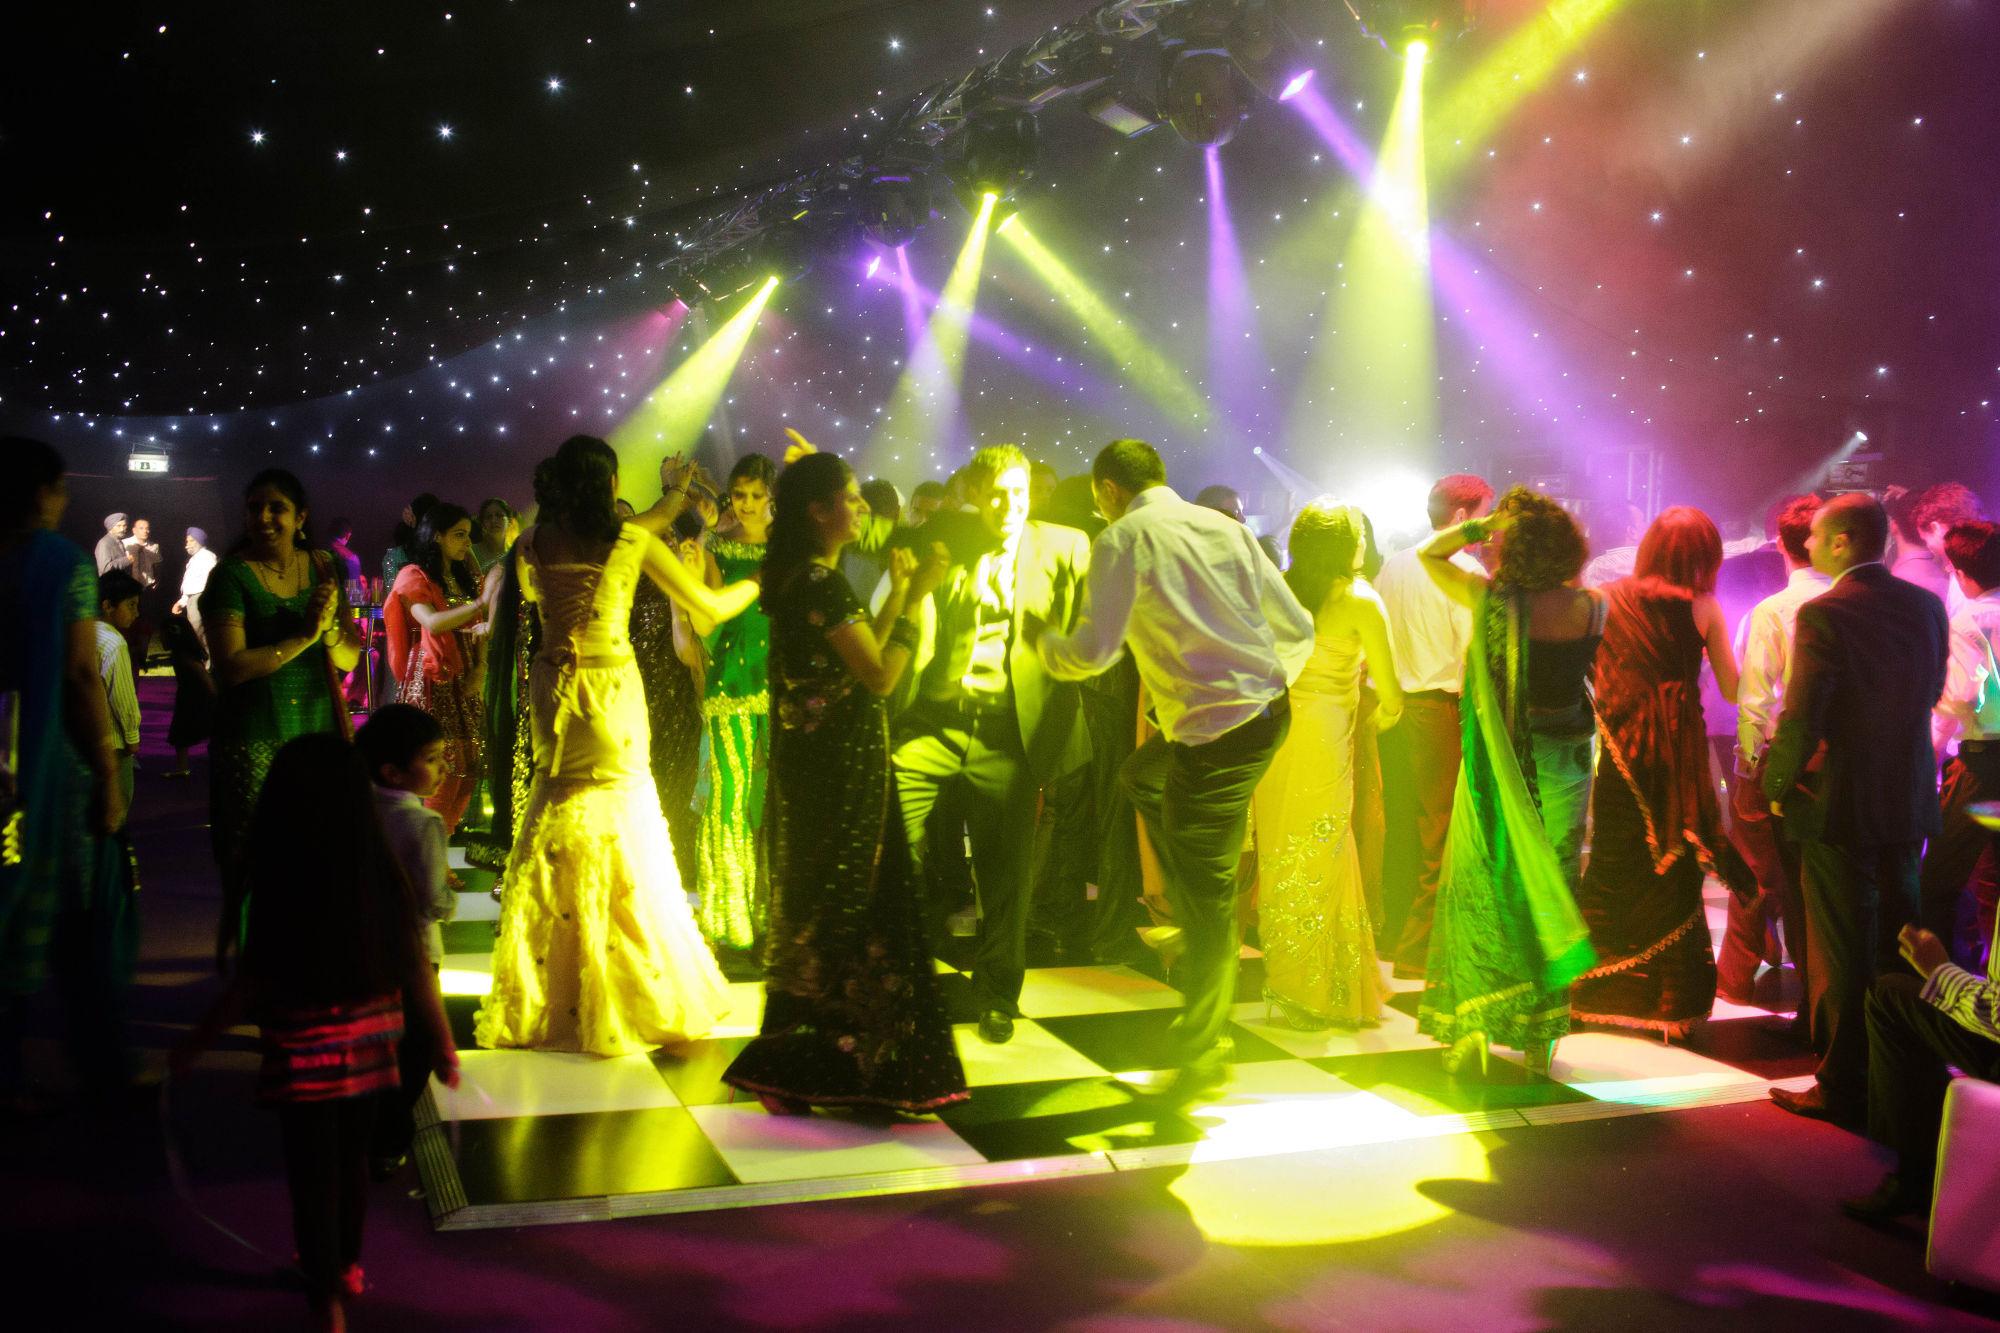 Private Hire - Black & White Dancefloor in Nightclub